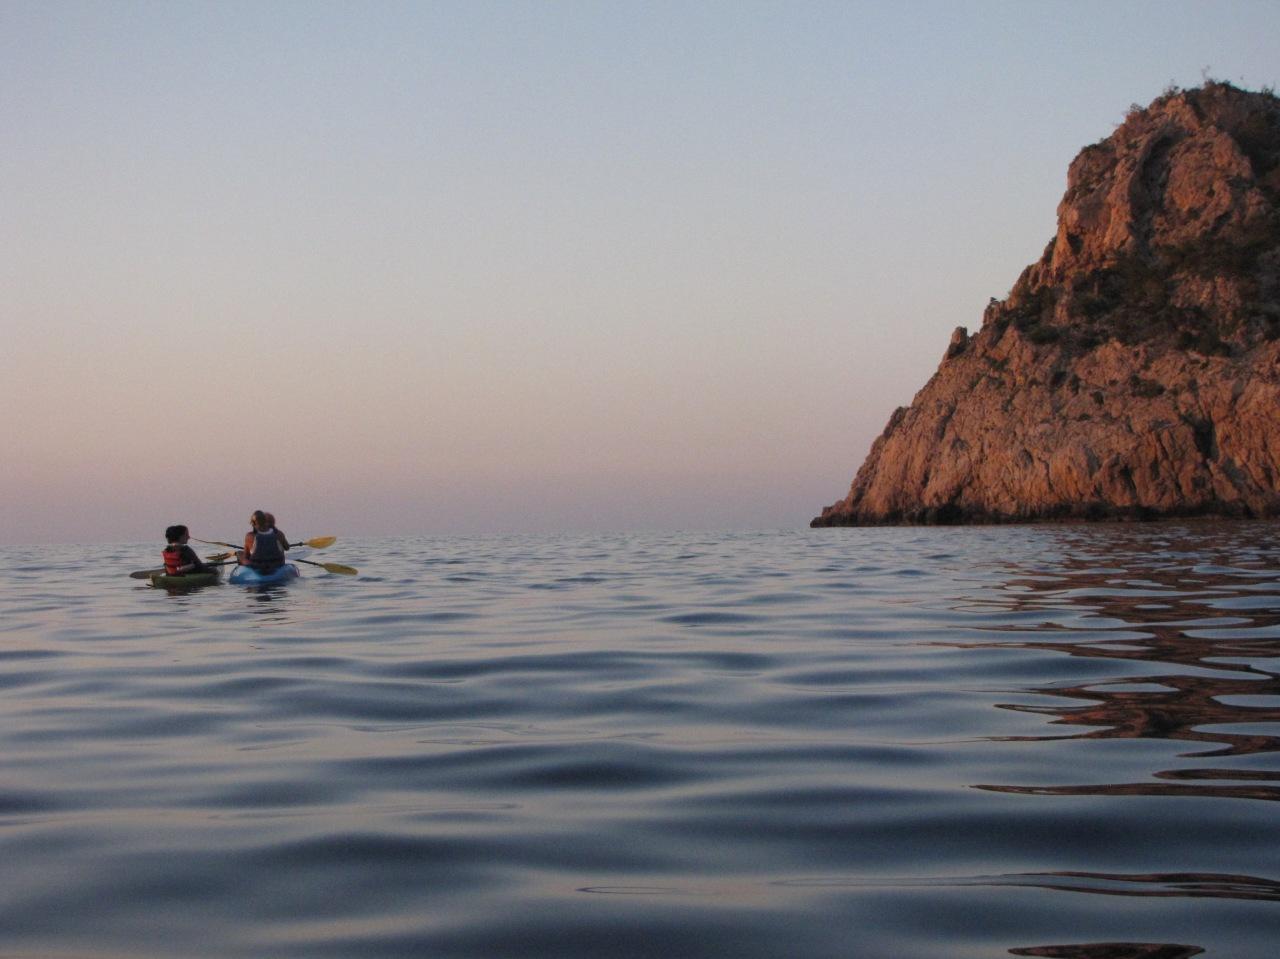 A Journey Through Spain's BalearicIslands